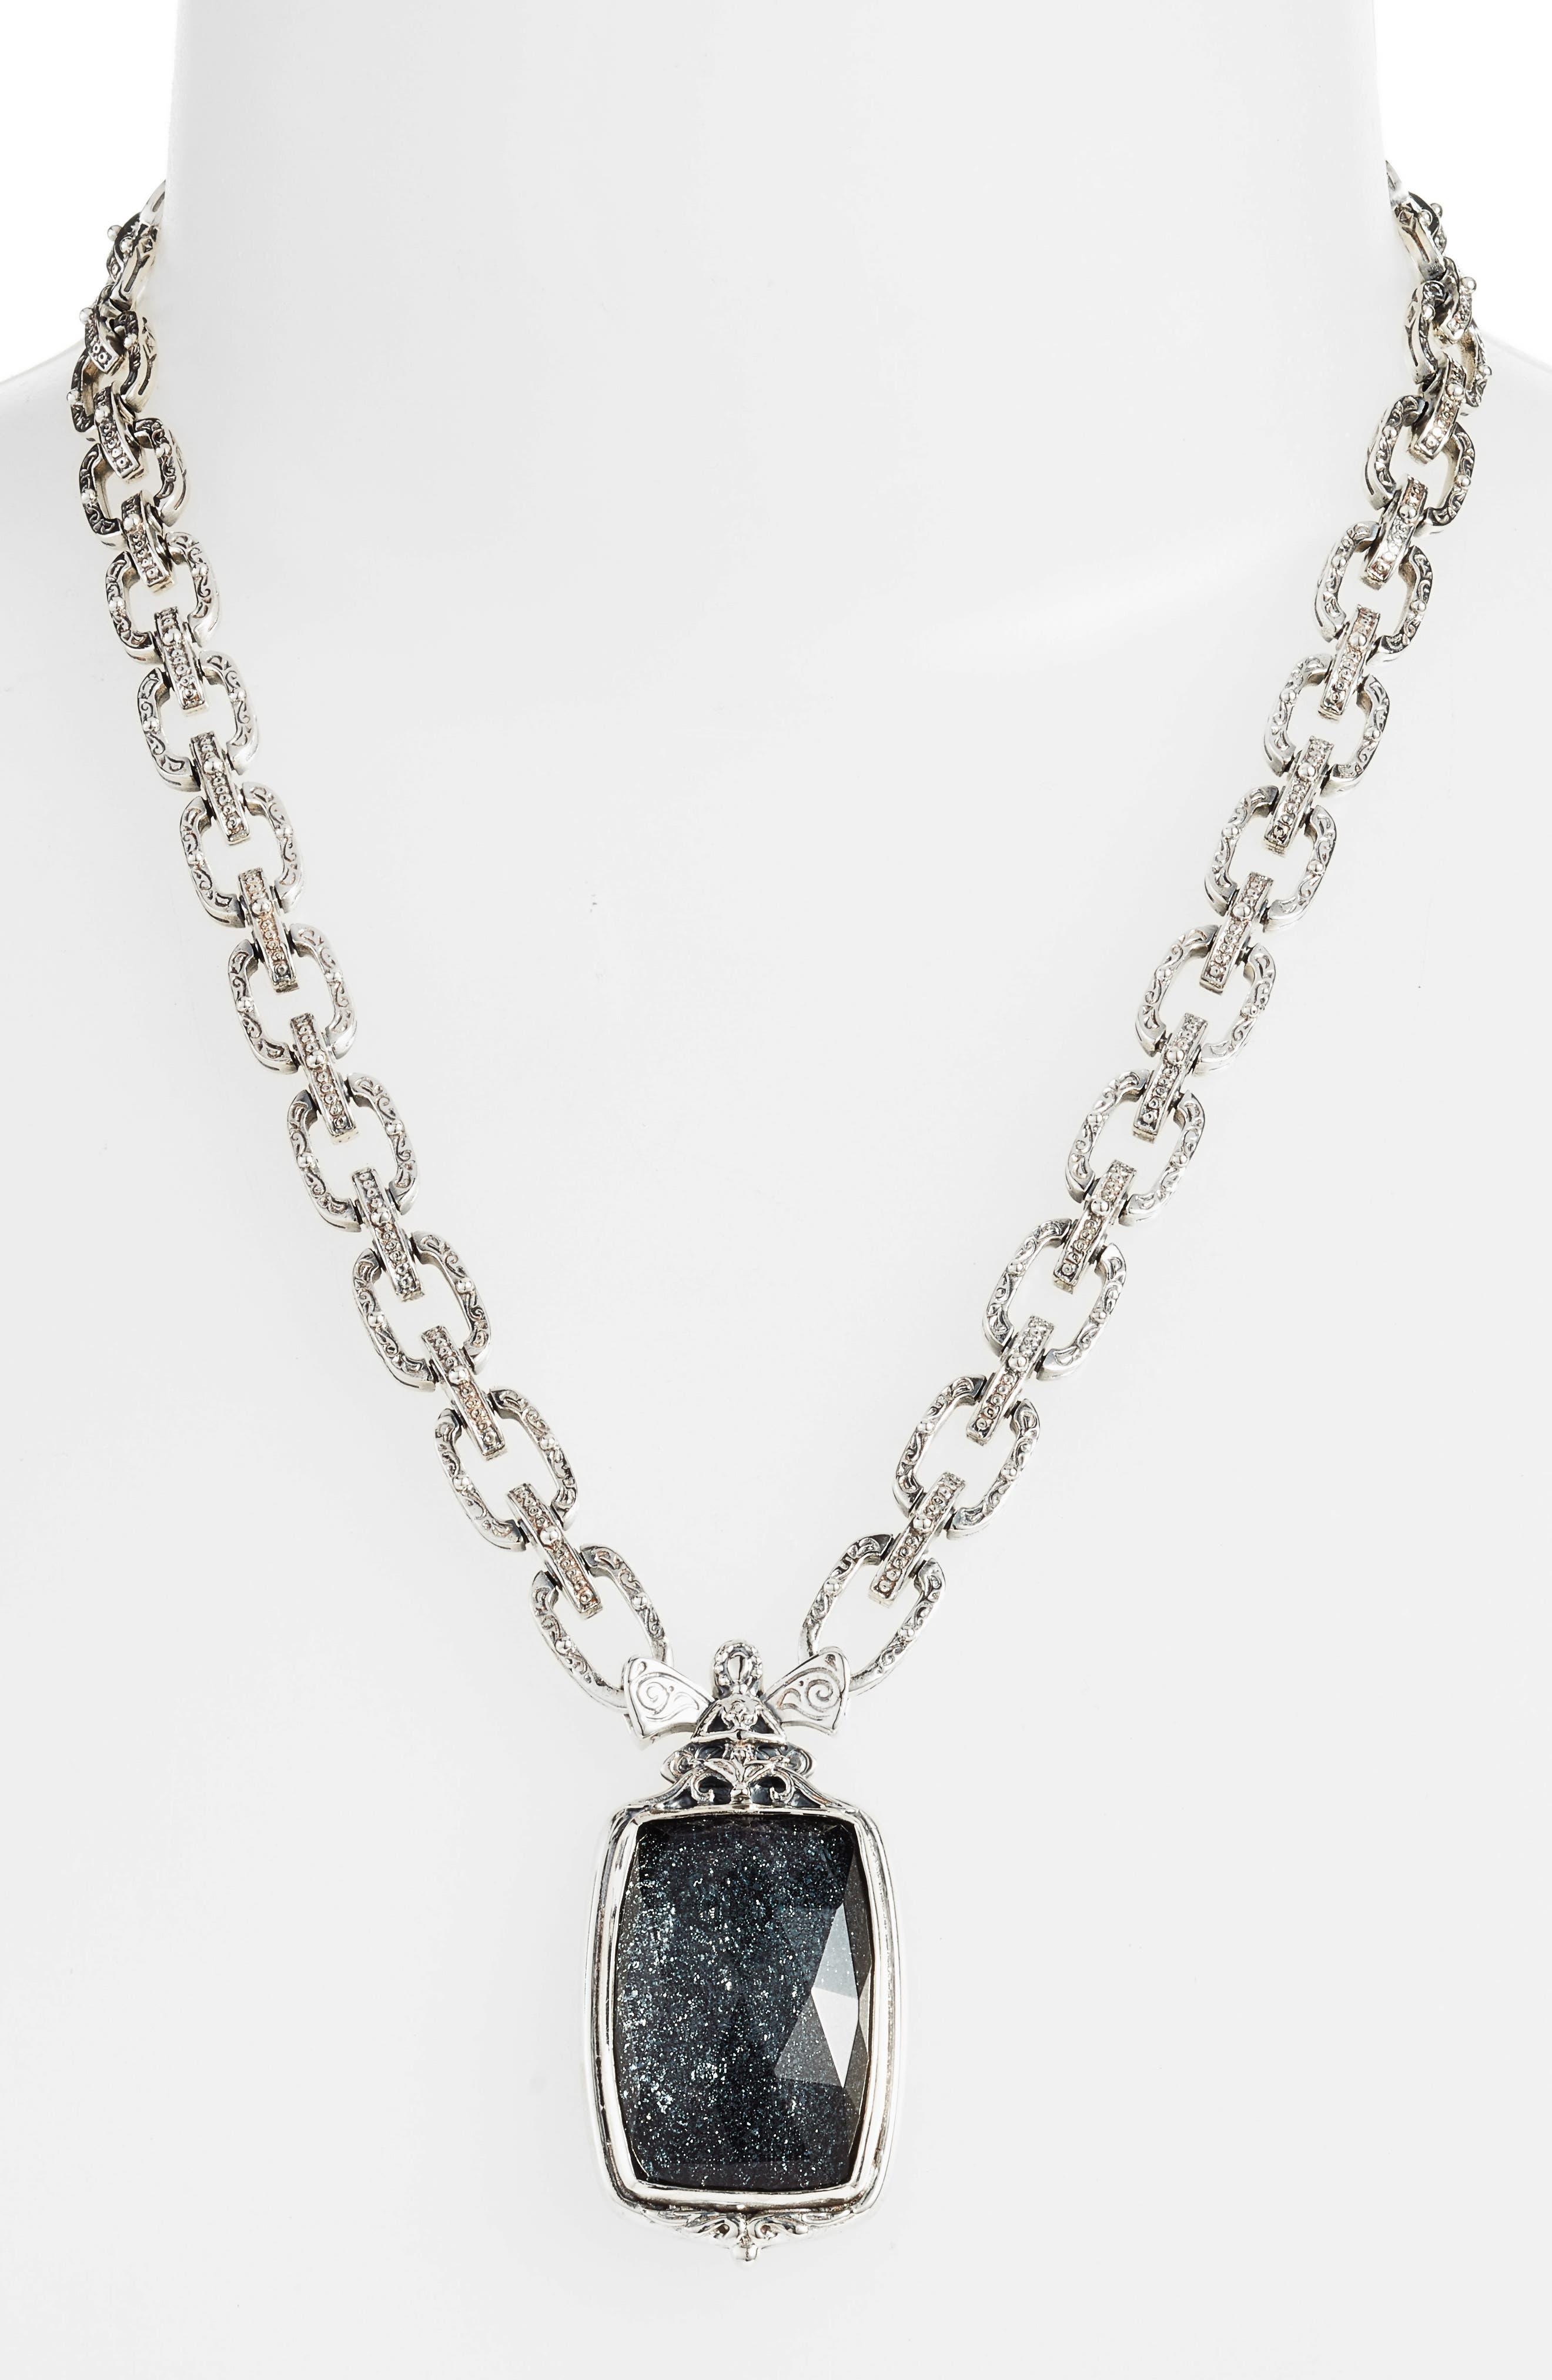 Santorini Hematite Pendant Necklace,                             Alternate thumbnail 2, color,                             Silver/ Hematite